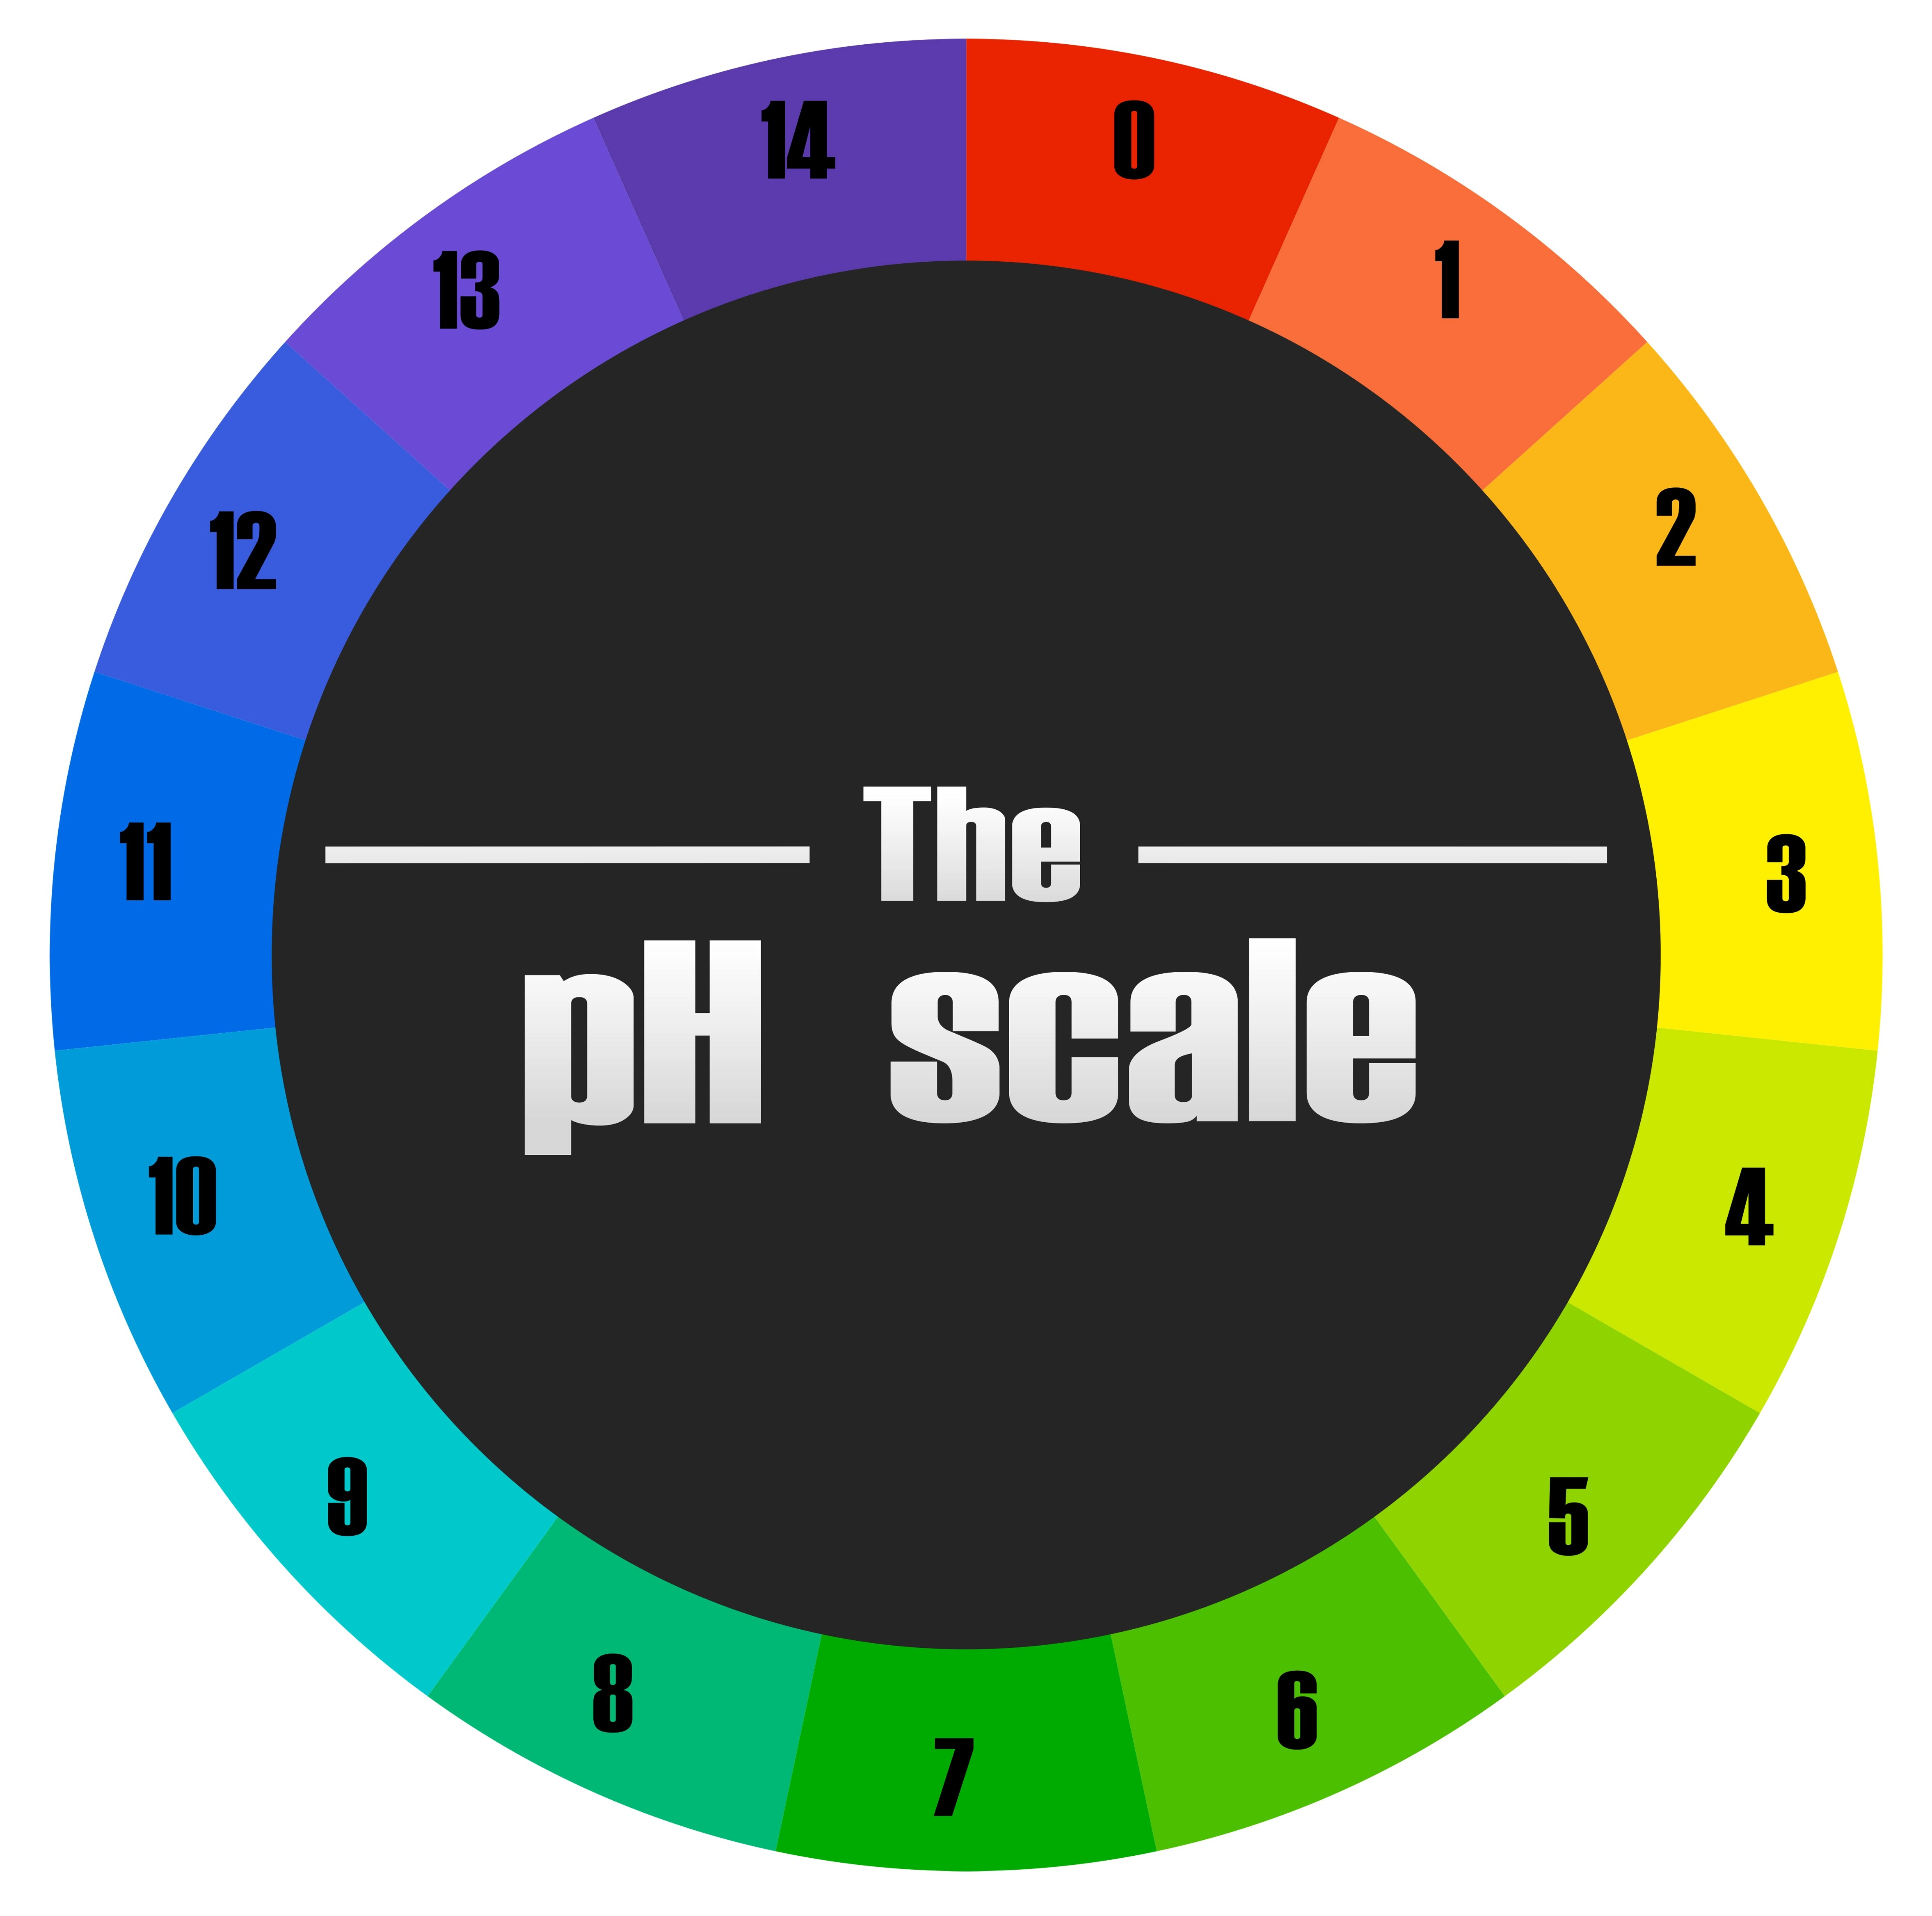 The Ph Scale Circle